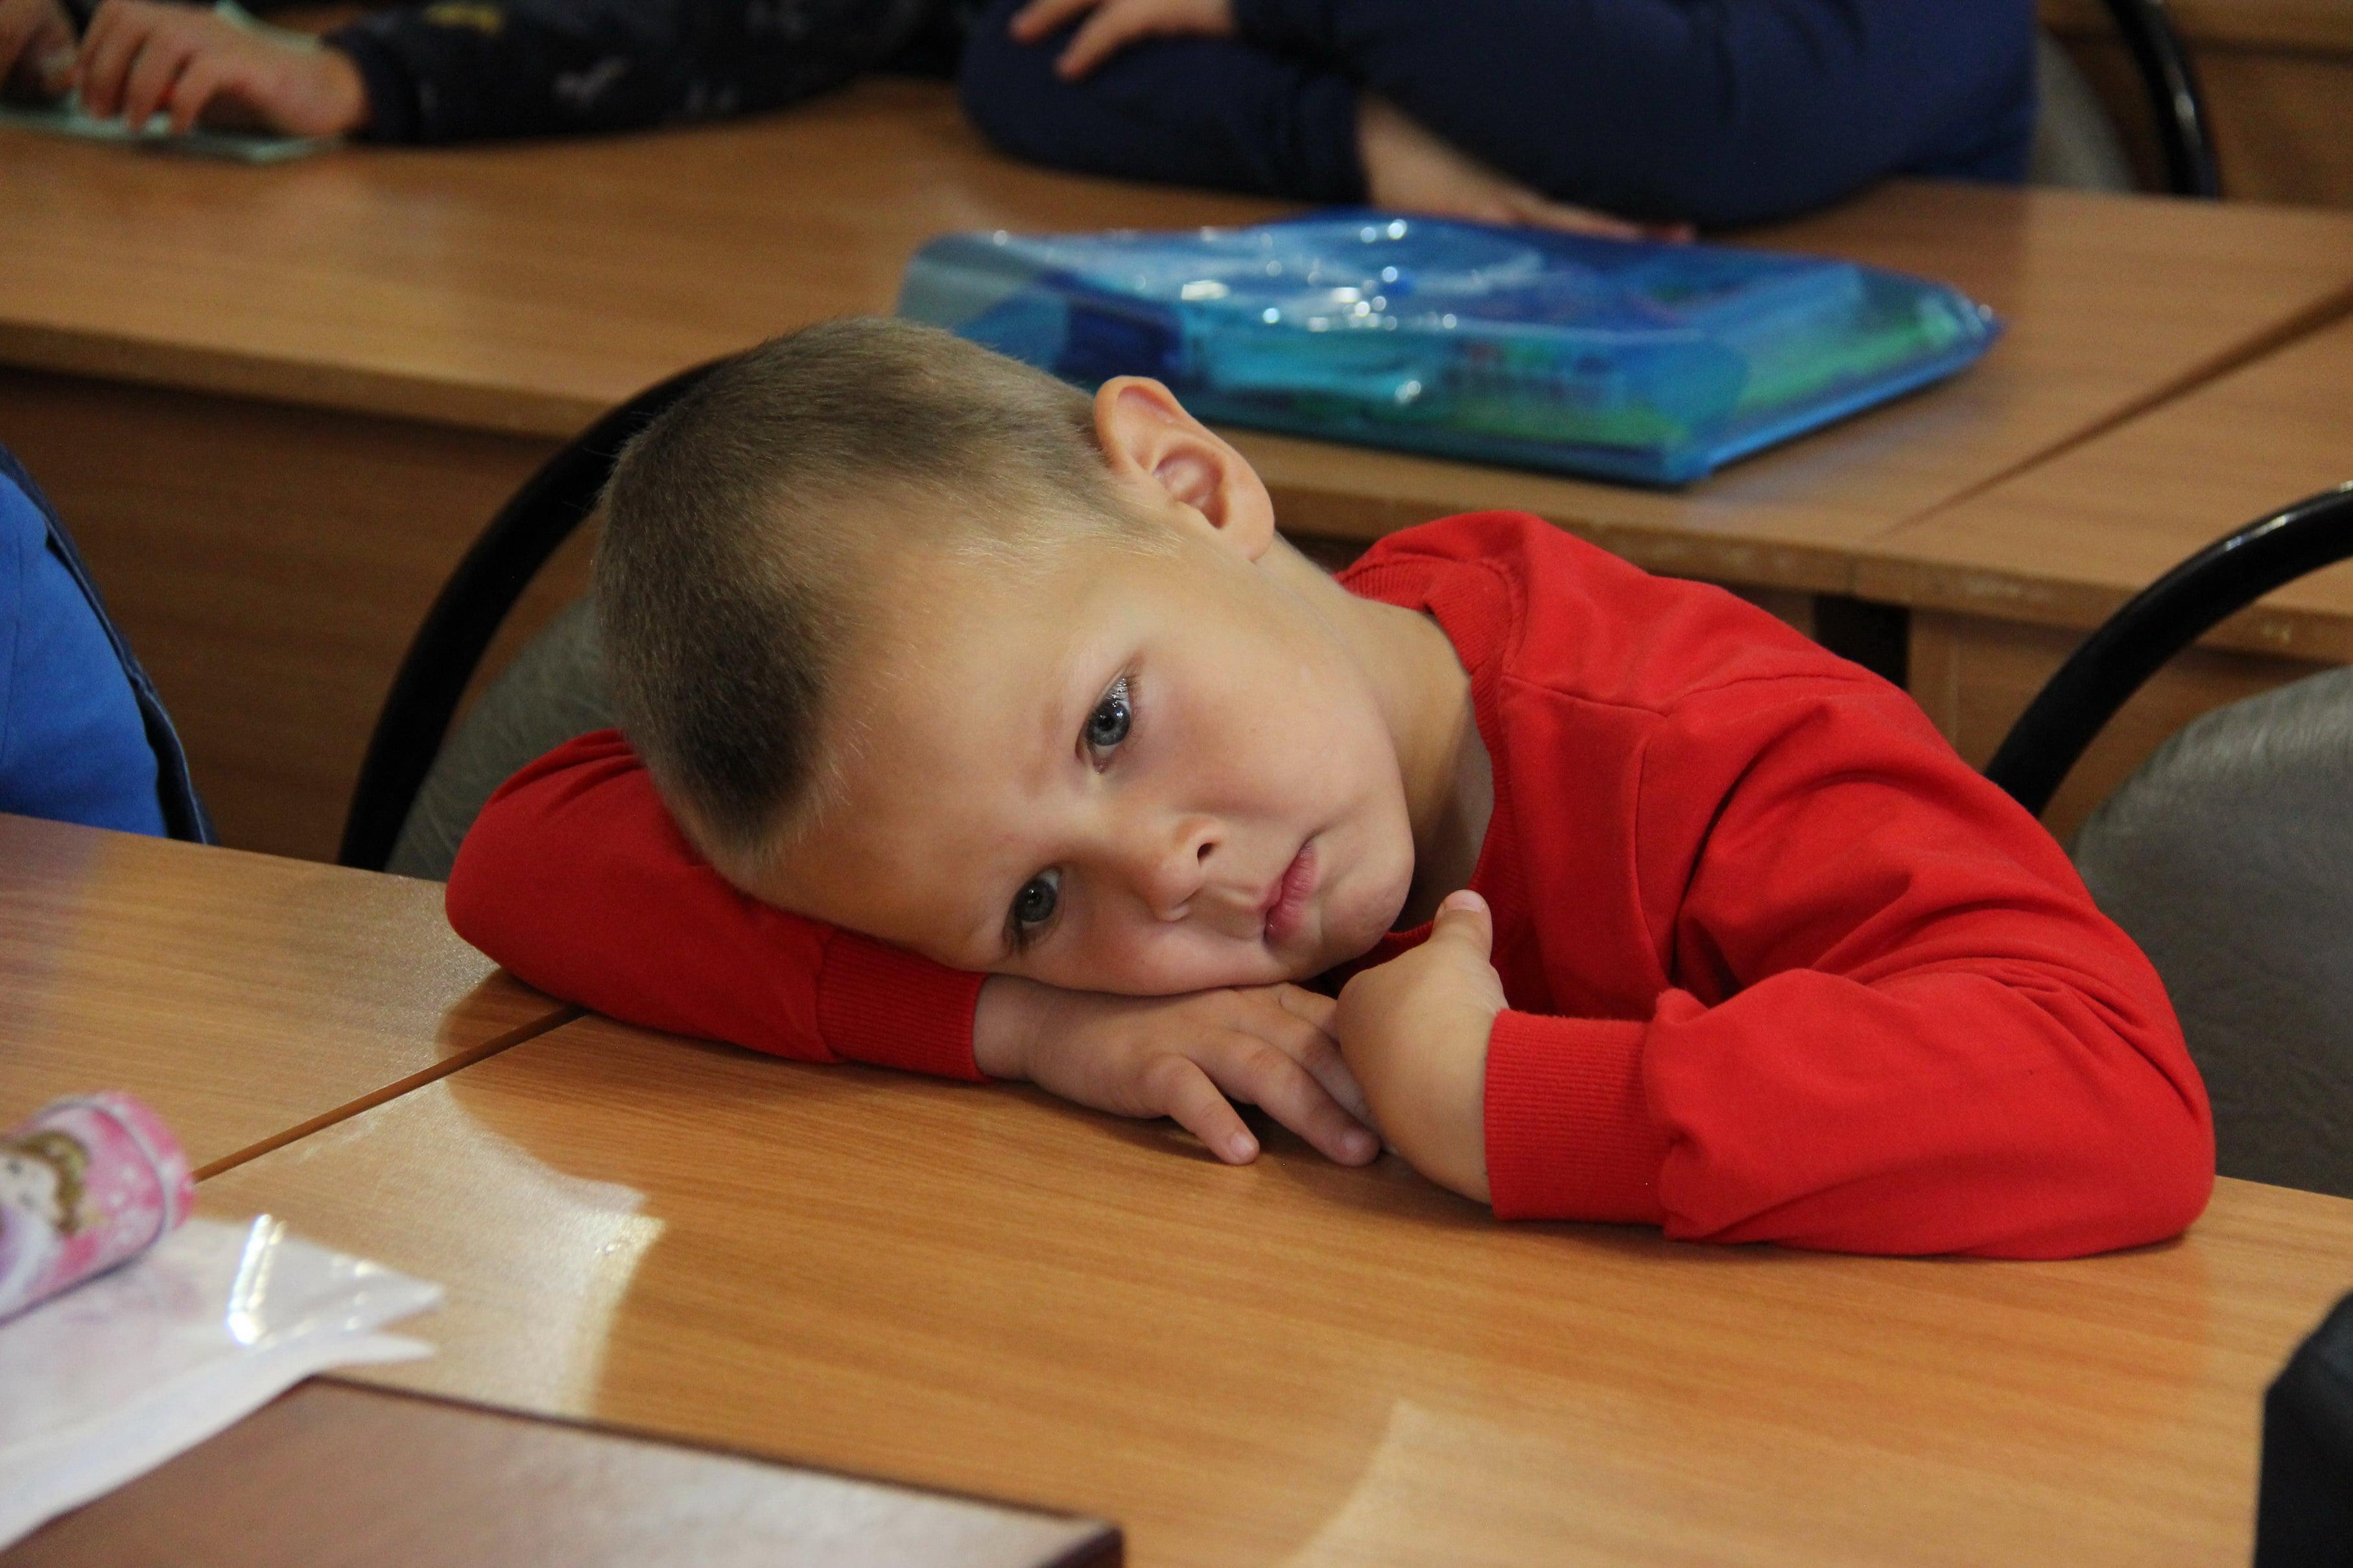 http://monuspen.ru/photoreports/88c681a8ee7fcb437fe27af18a17a71t.JPG